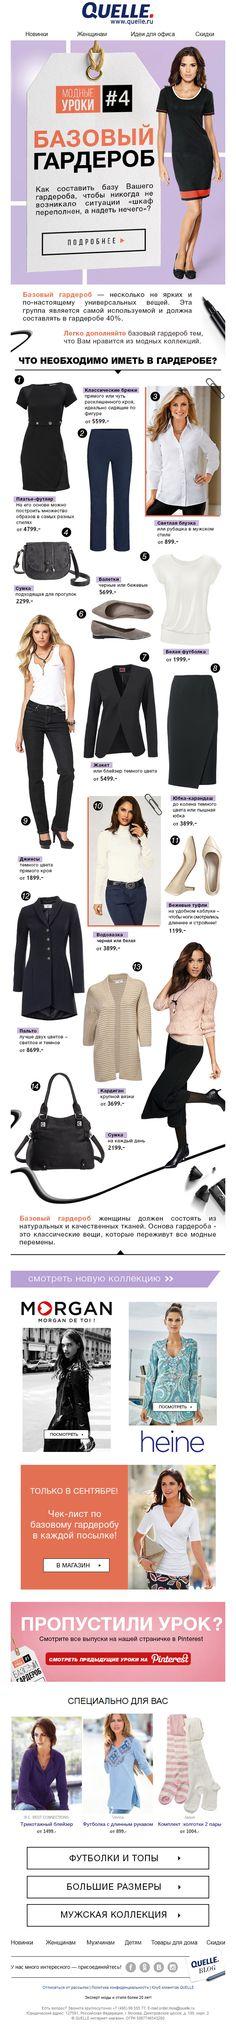 мода, уроки моды, стиль, базовый гардероб